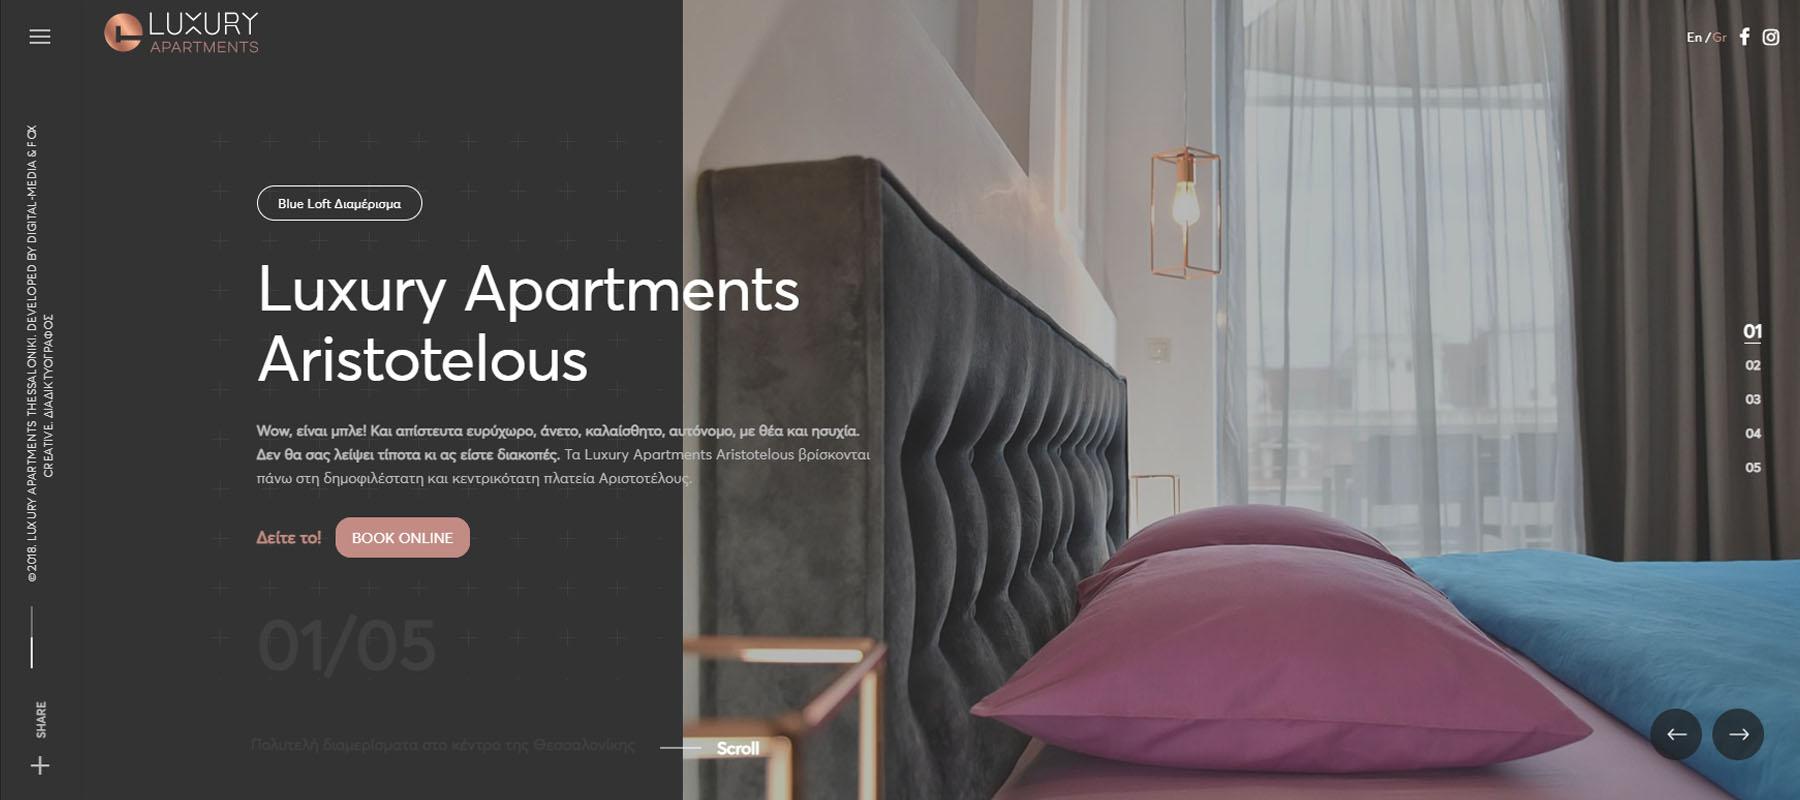 Luxury Apartments Aristotelous